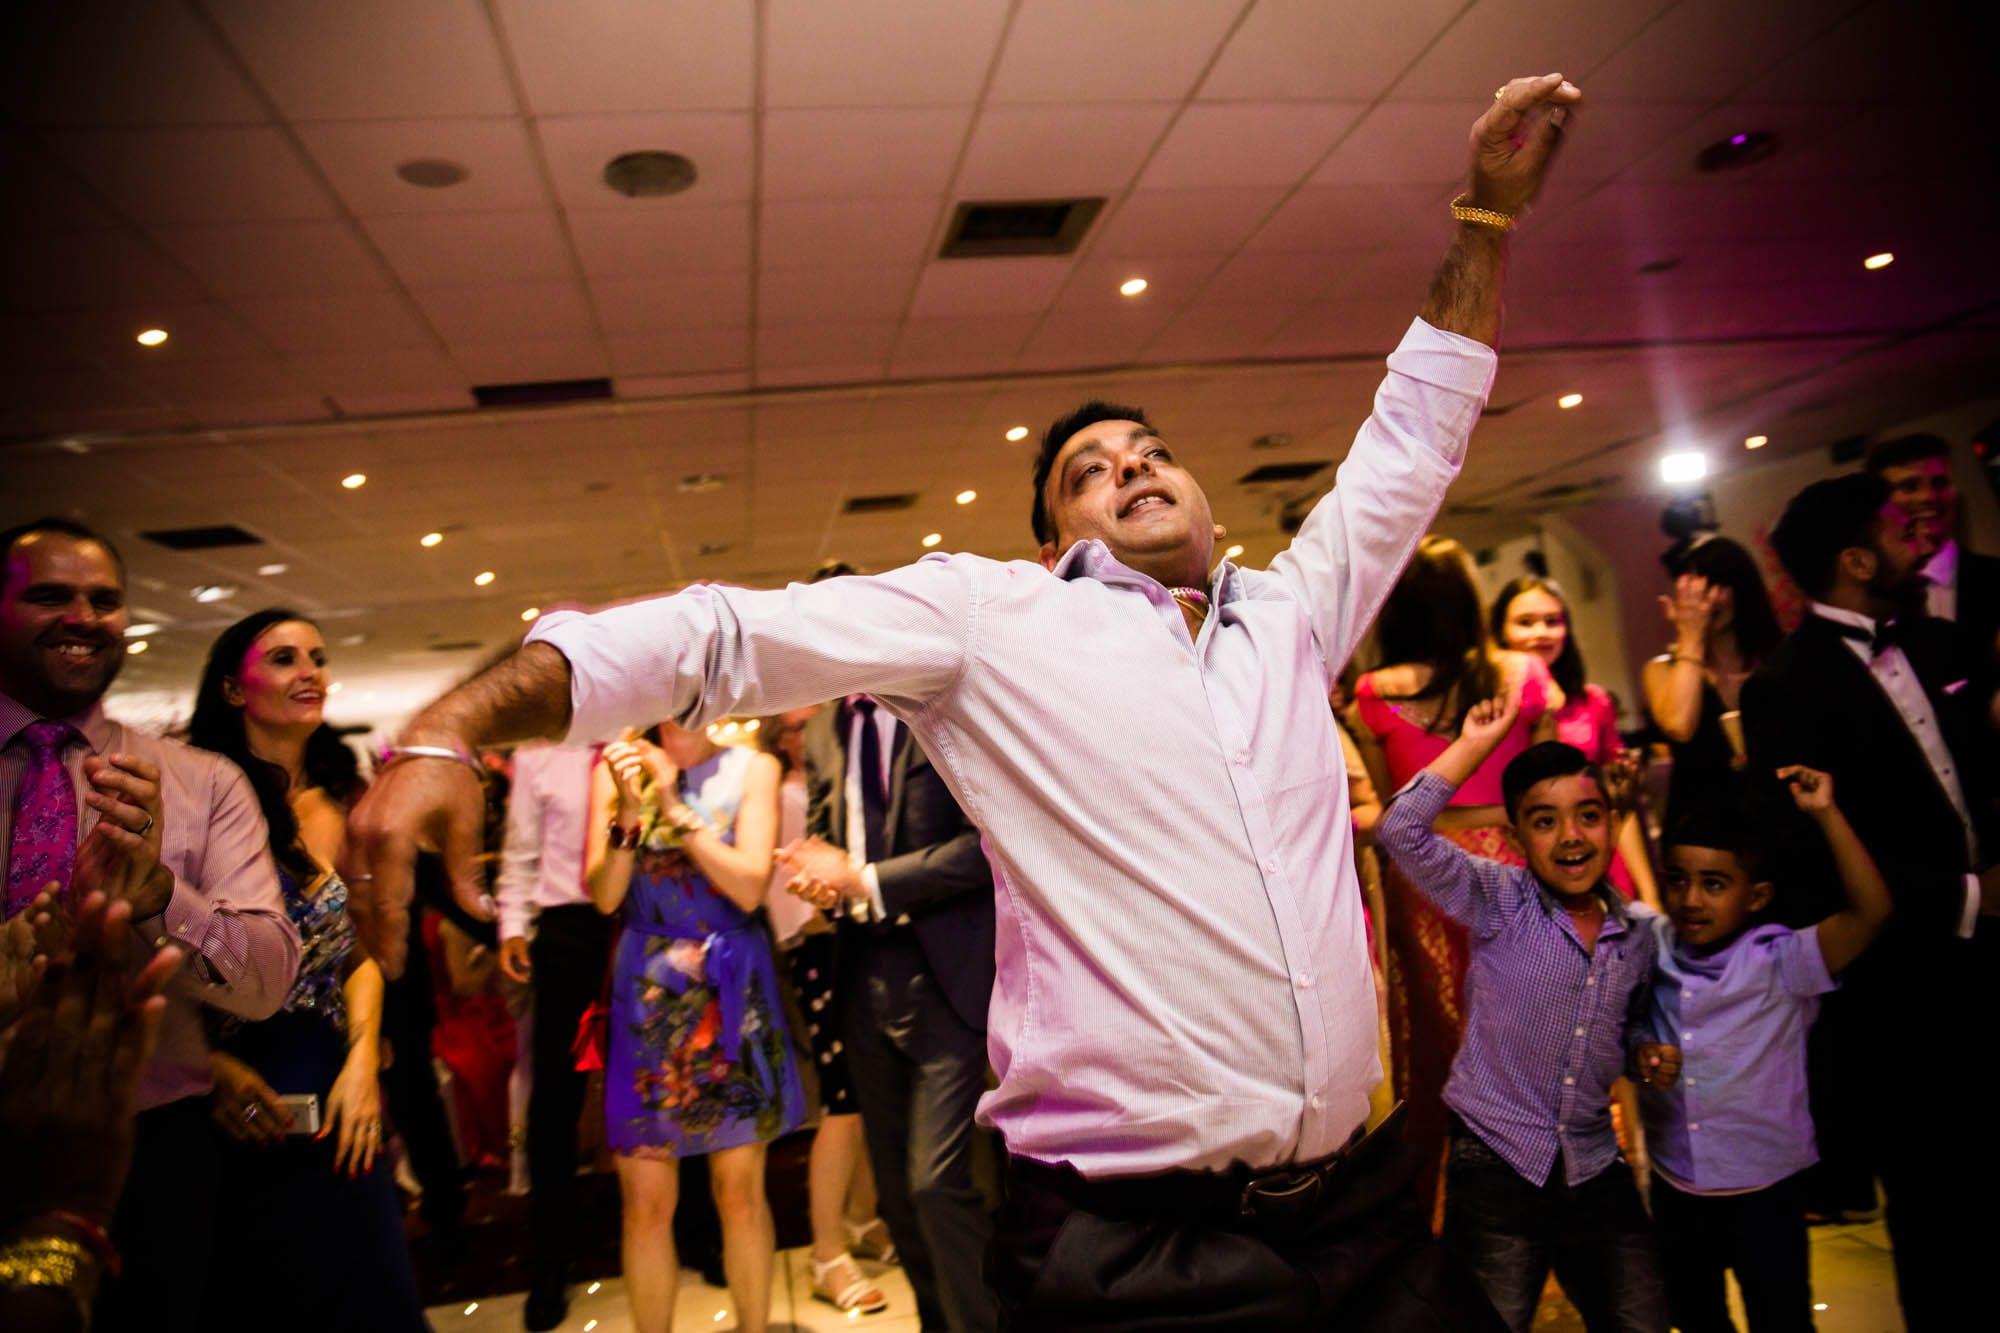 Fun Indian Wedding Photos